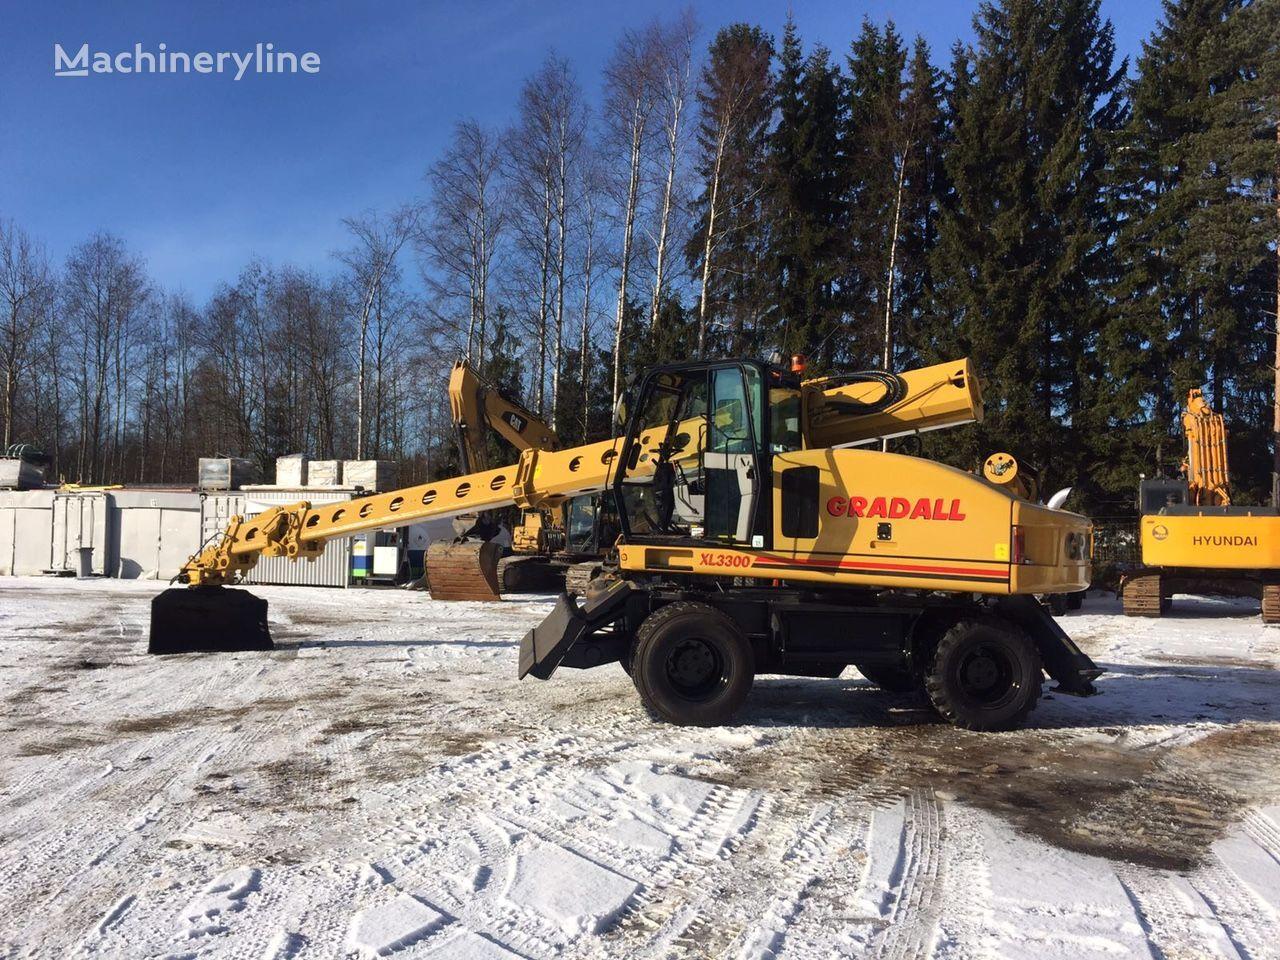 GRADALL XL 3300 wheel excavator